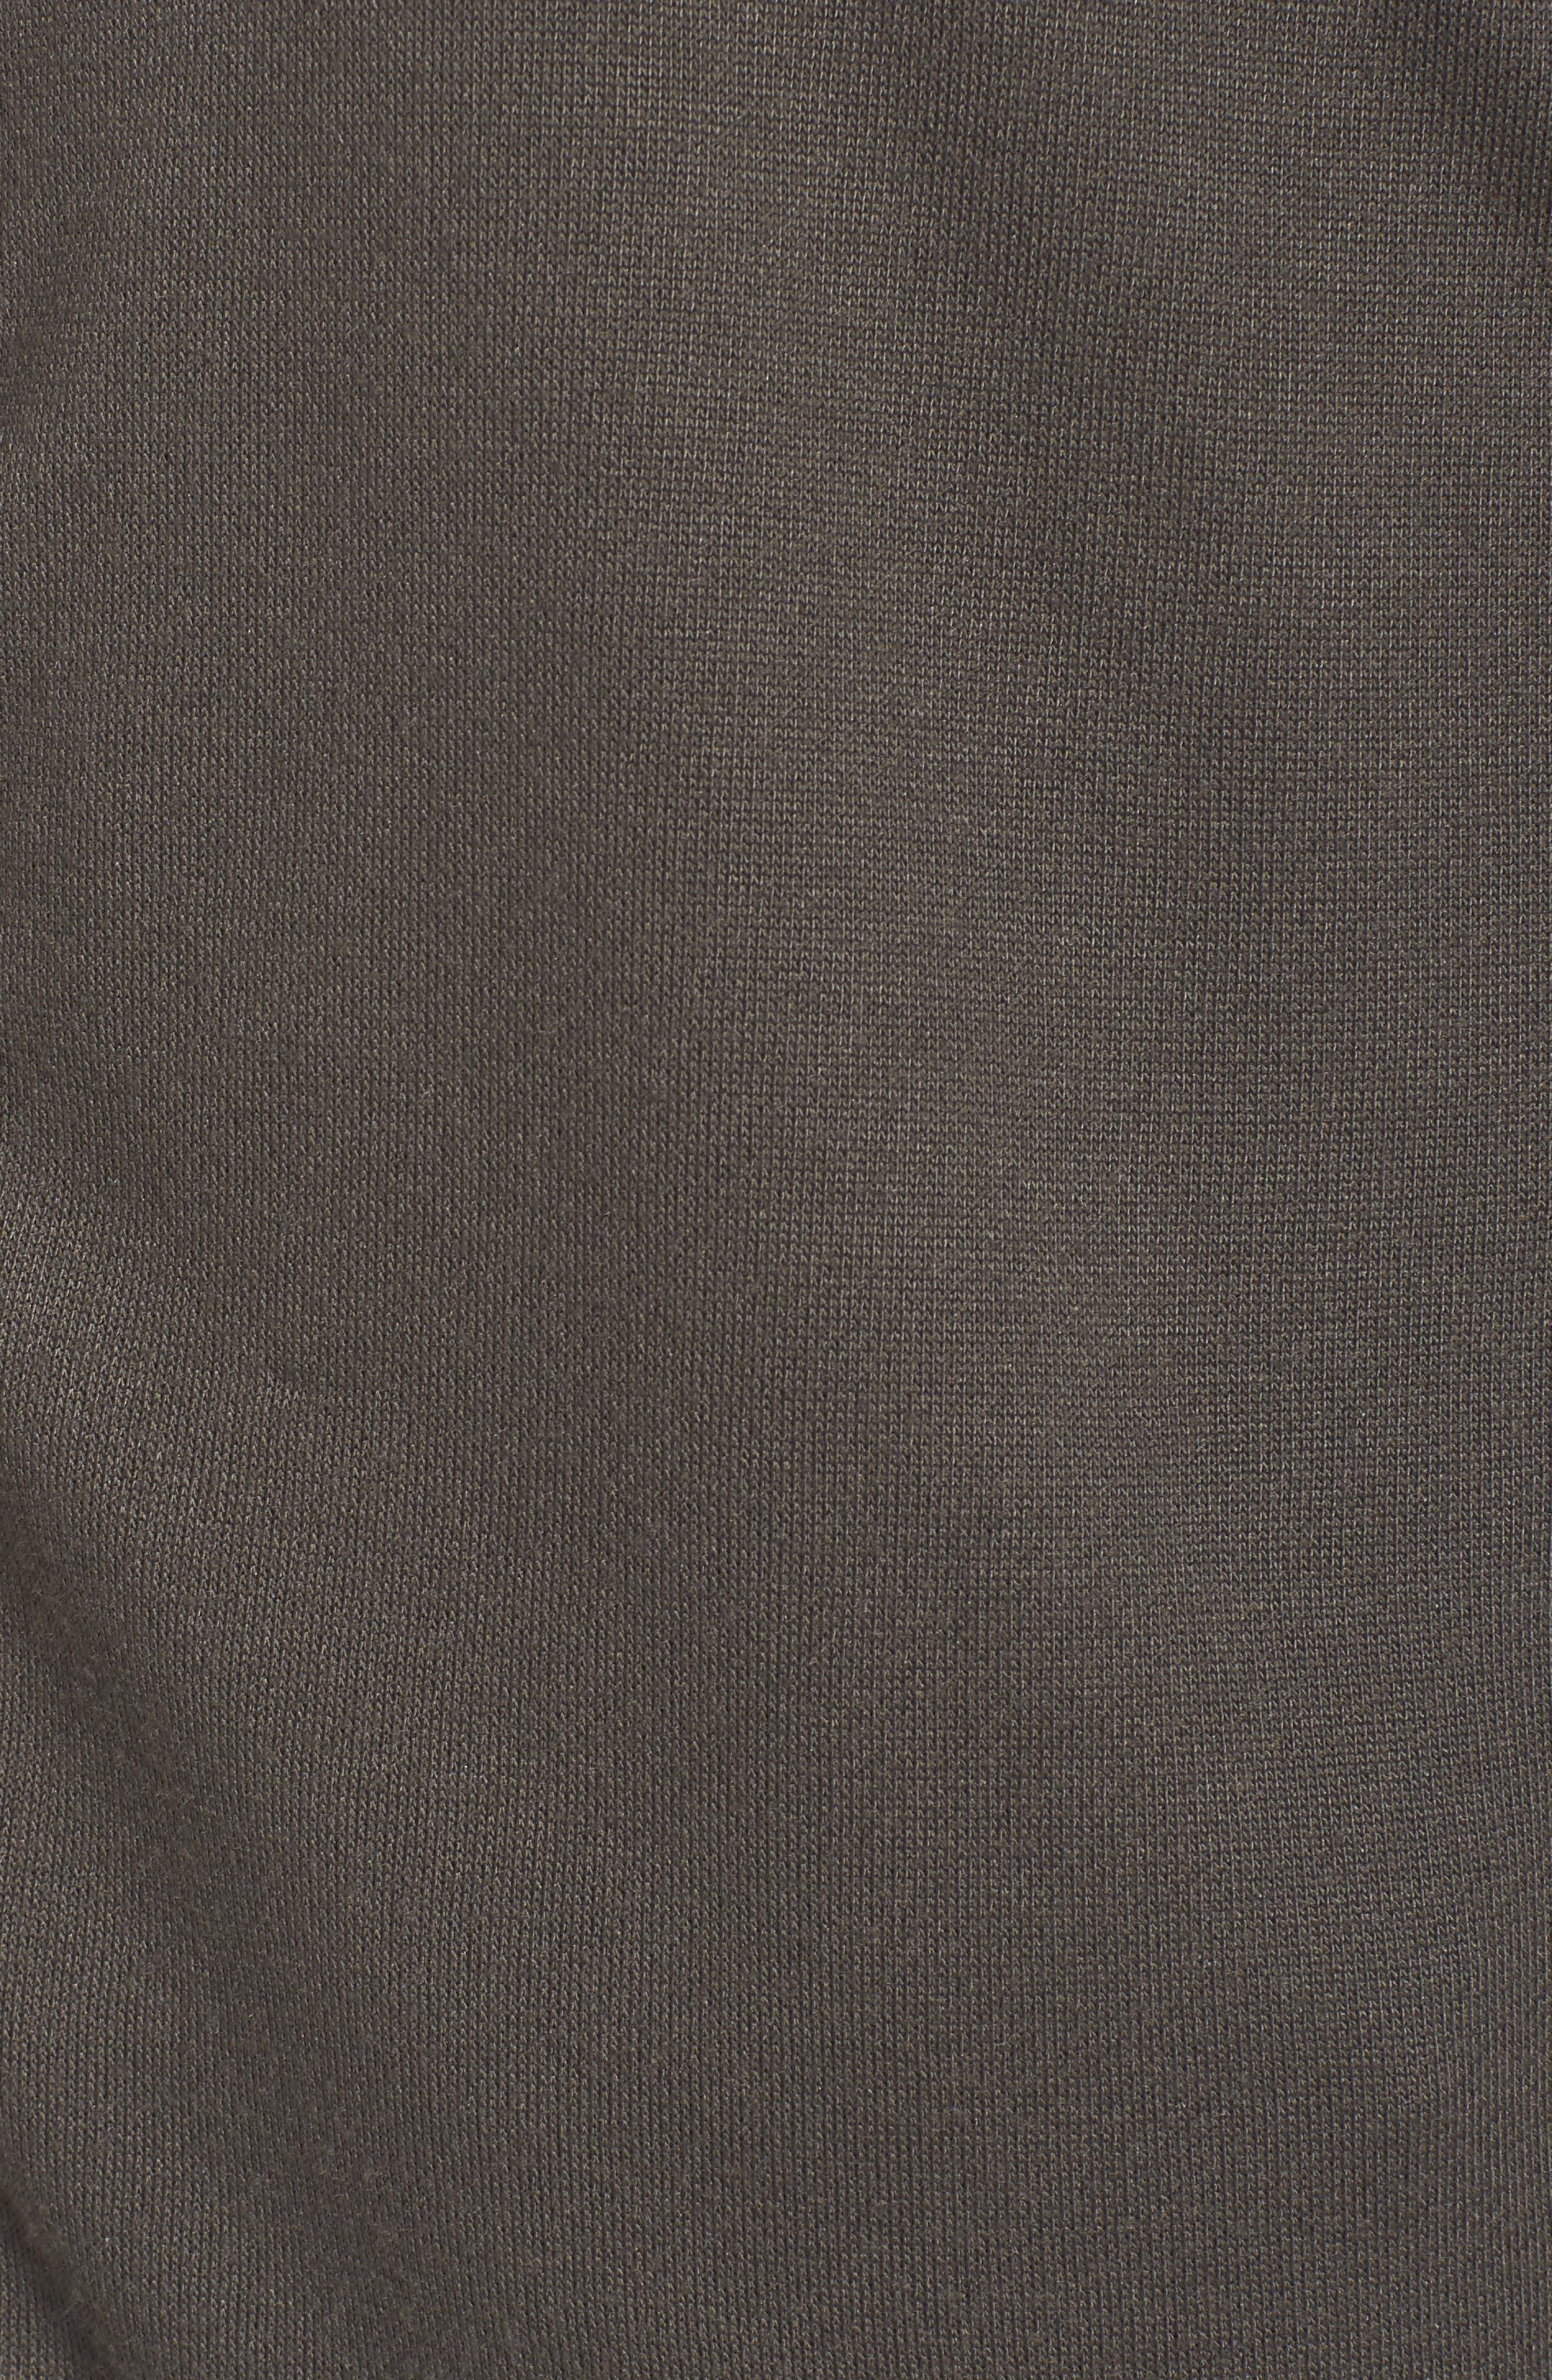 Oversize Zip-Up Hoodie,                             Alternate thumbnail 5, color,                             Dove Grey